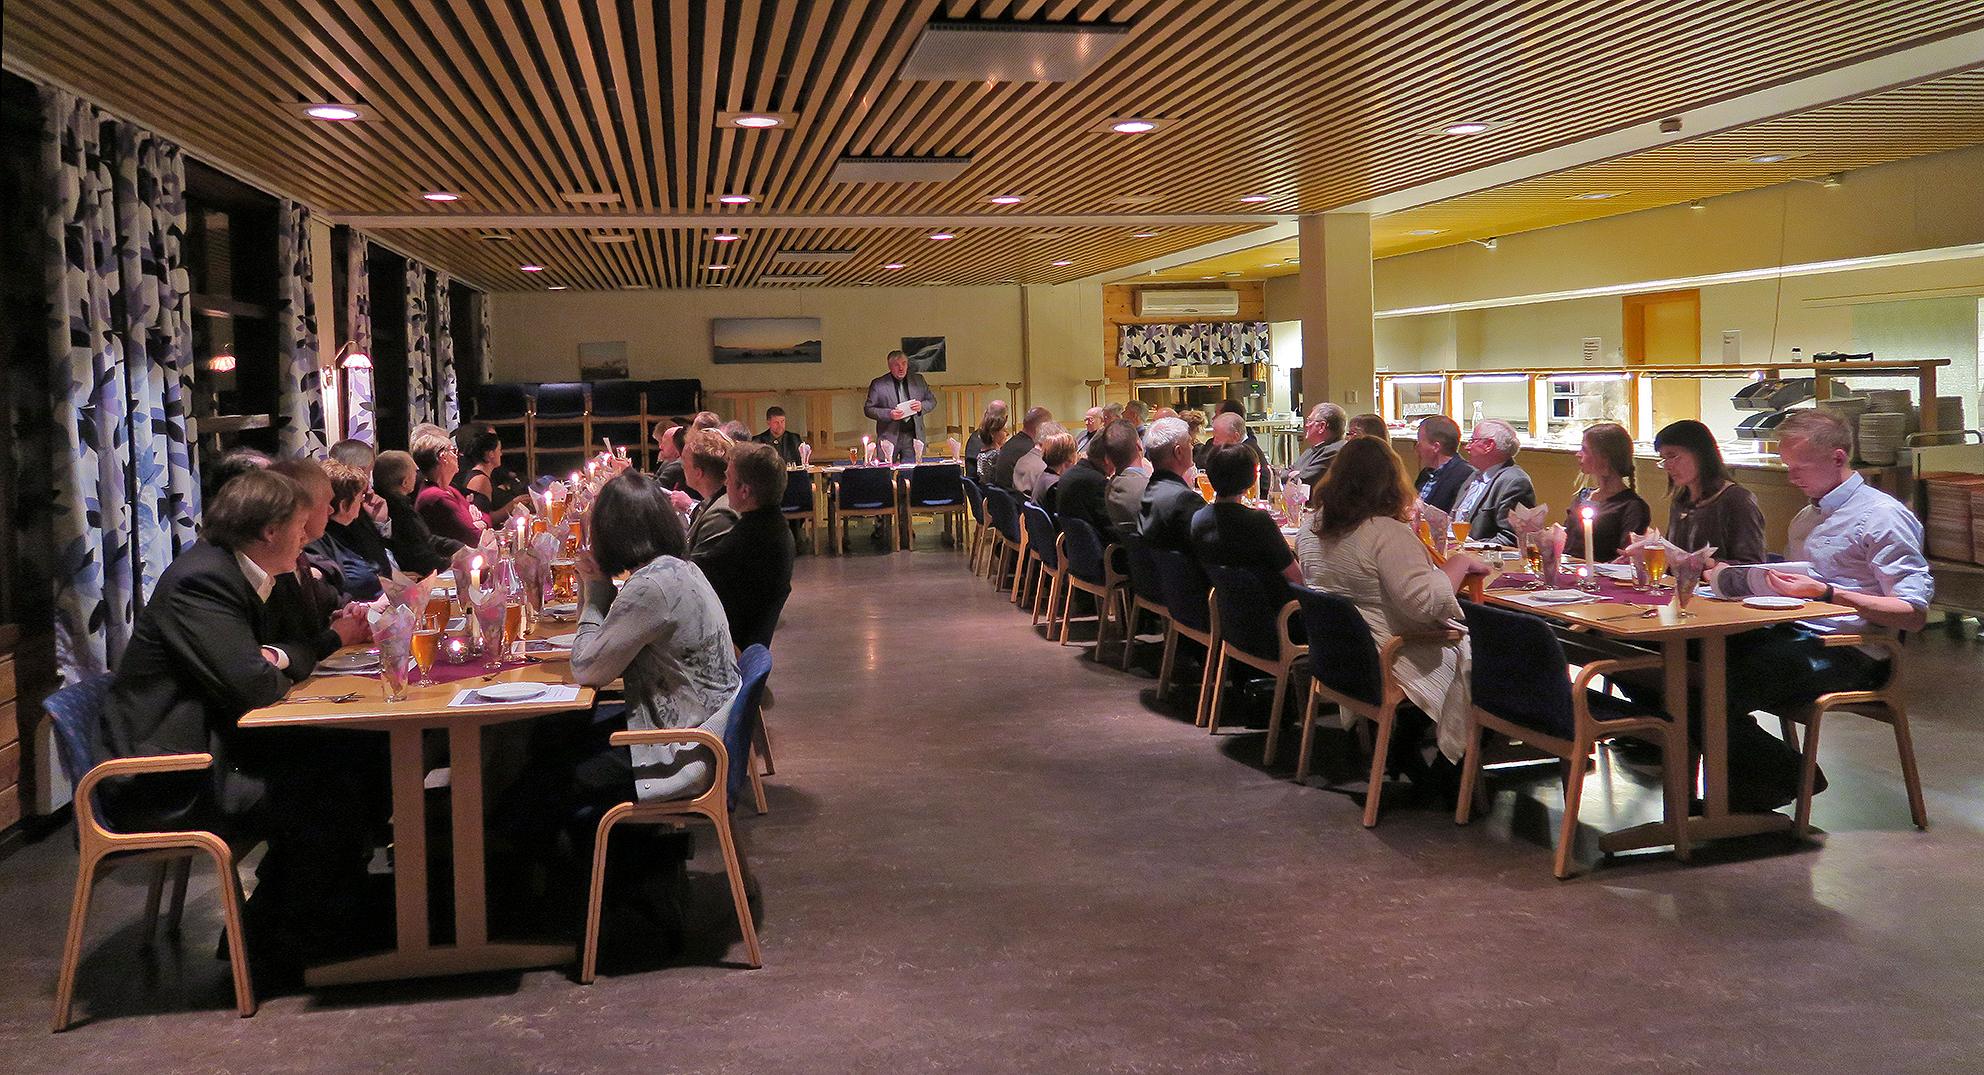 Jubileumsfesten lørdag var lagt til Løvåsen leir i Haltdalen med festmiddag, taler, bildevisning, dans og hyggelig samvær. Her ønsker Hallvard Urset, leder i villreinutvalget, velkommen til bords. Foto: A. Nyaas